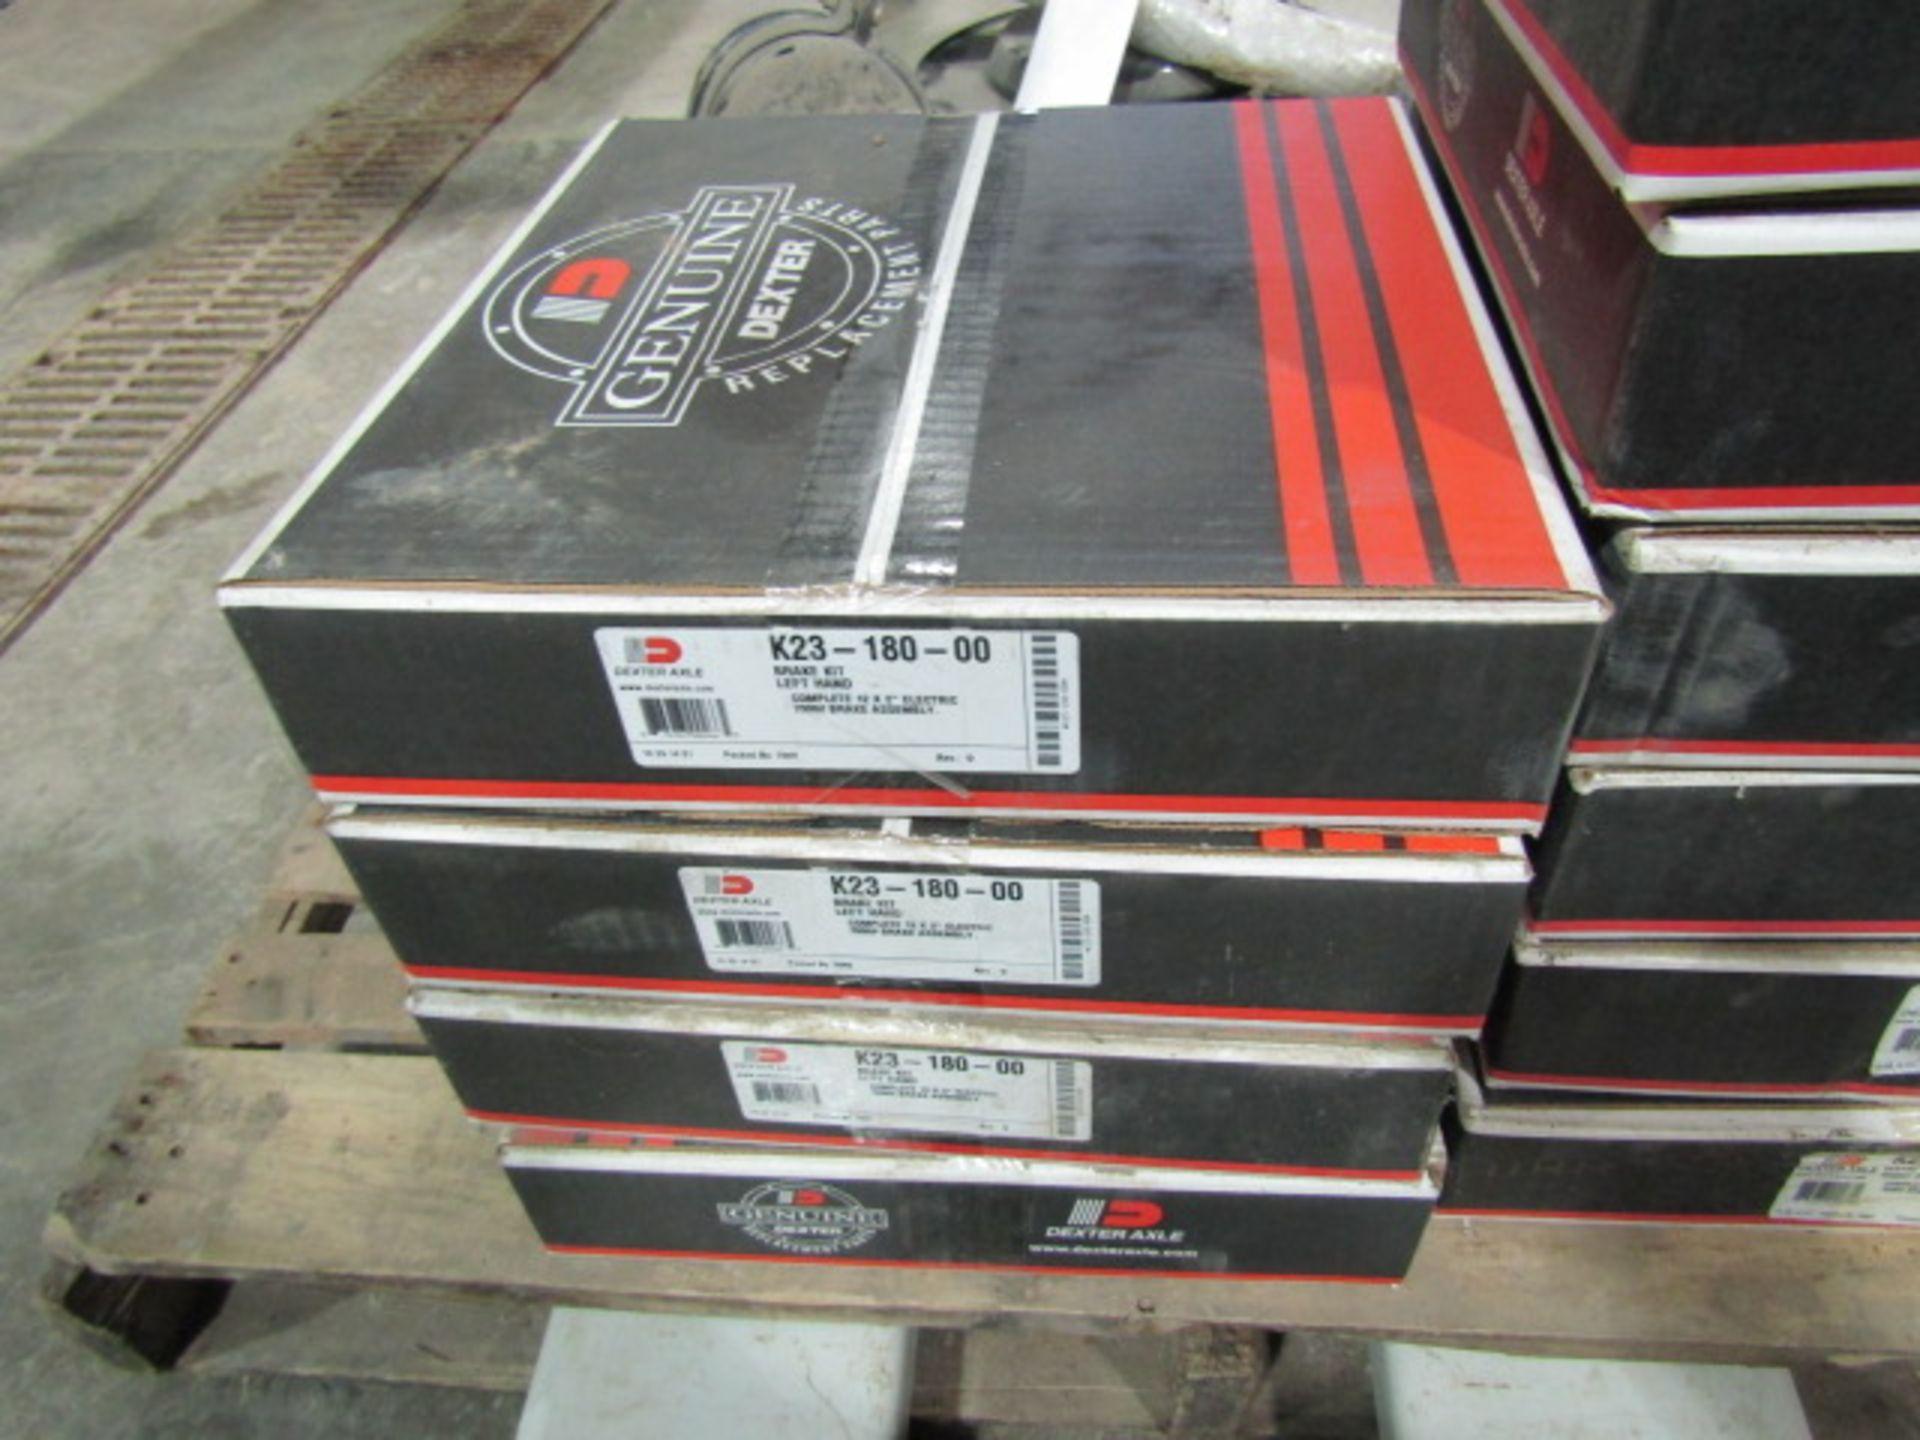 Lot 304 - (11) New Dexter Axle Brake Kit, 7000# Brake Assembly K23-181-00, Located in Winterset, IA